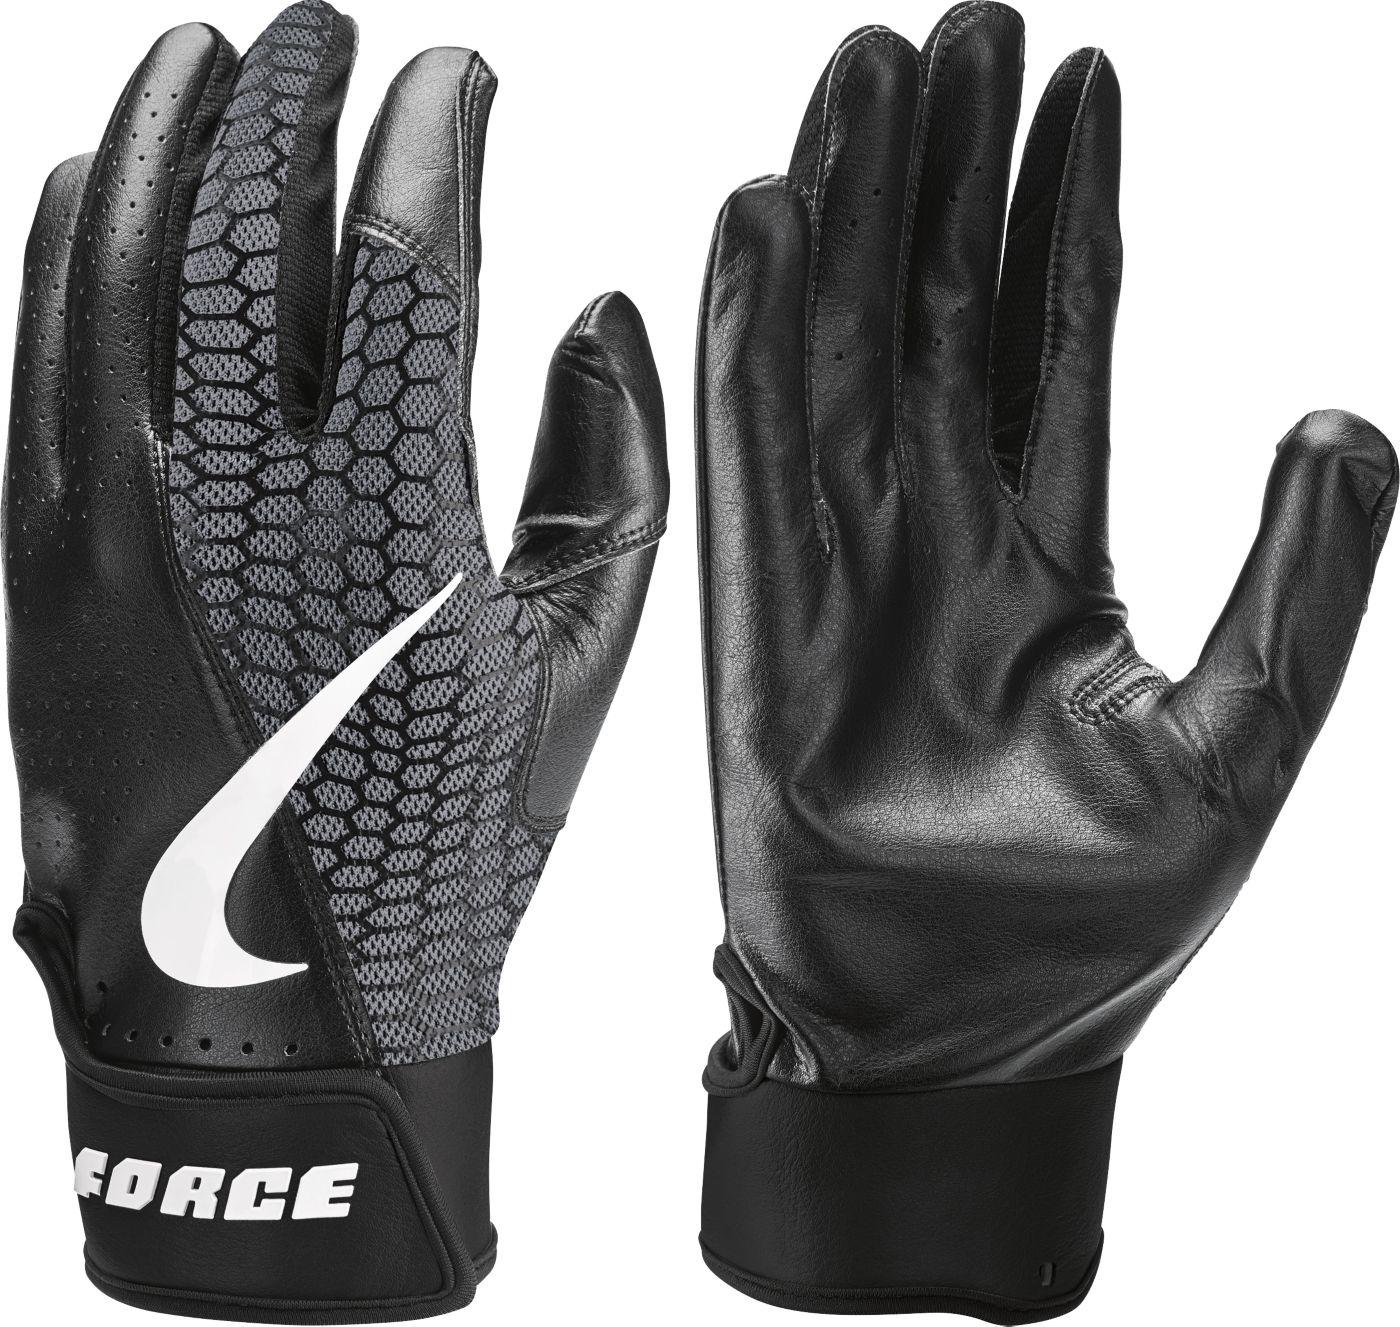 Nike Adult Force Edge Batting Gloves